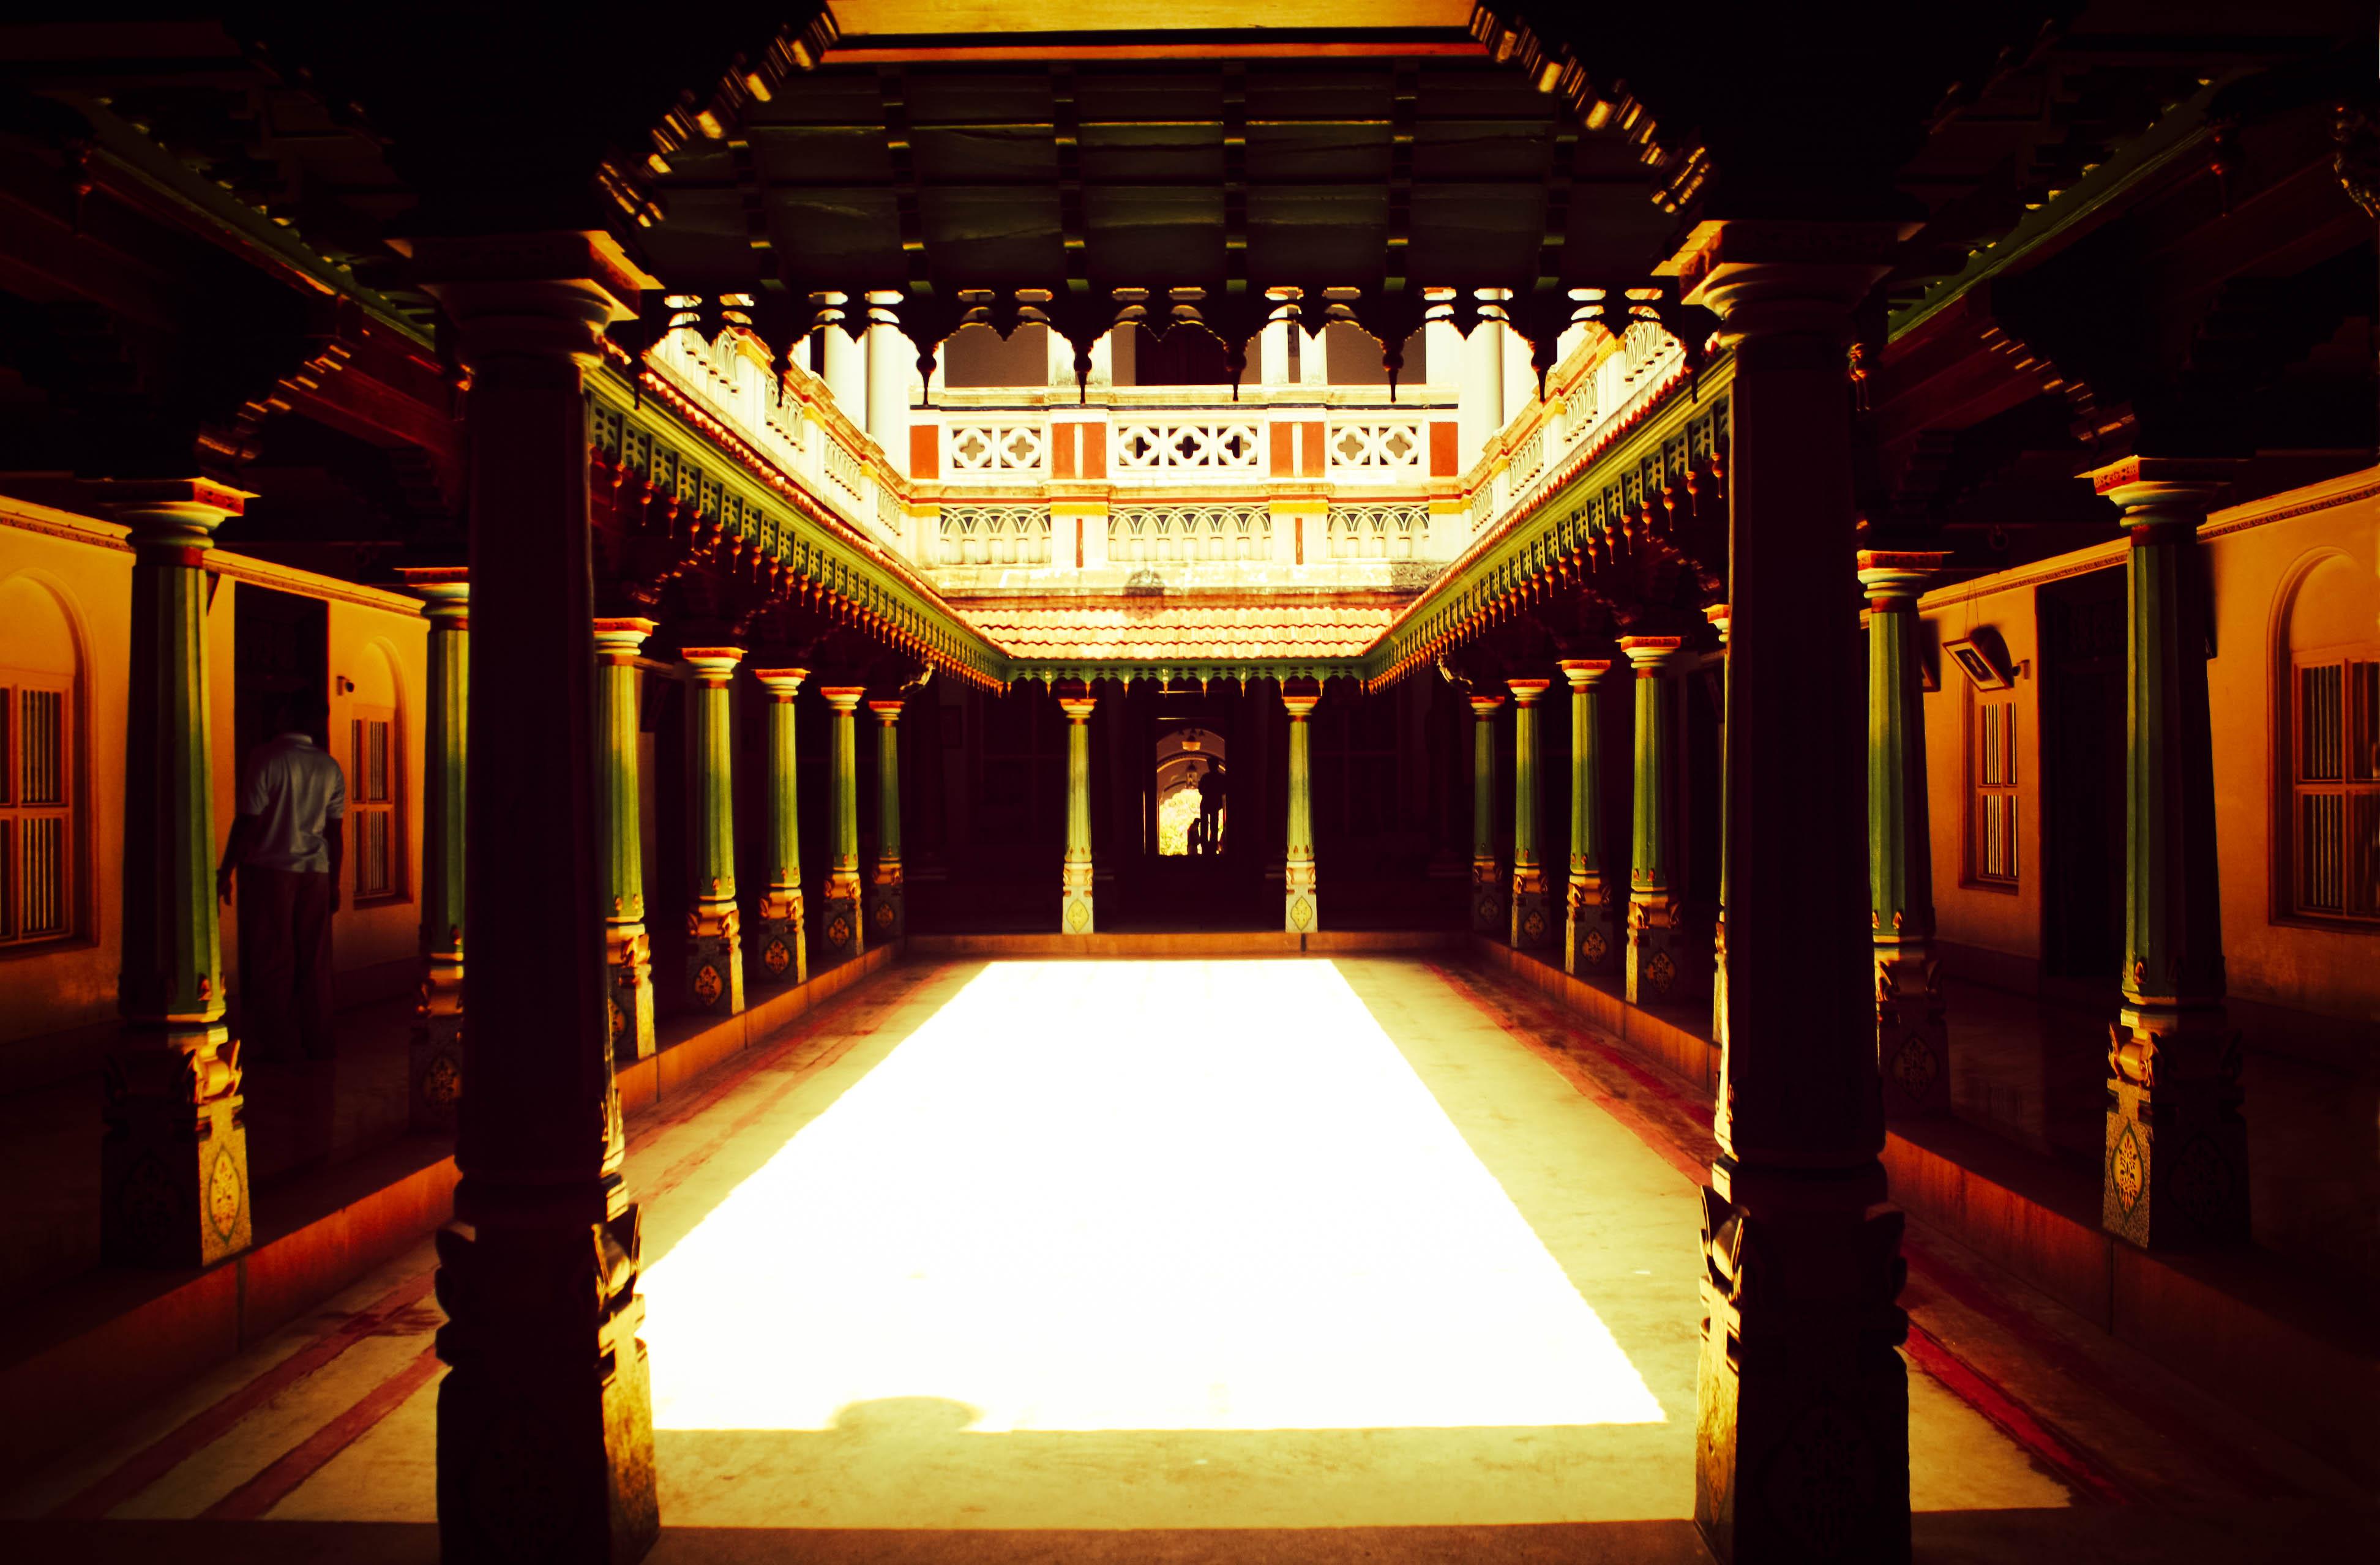 File:Chettinad palace in Karaikudi.jpg - Wikimedia Commons